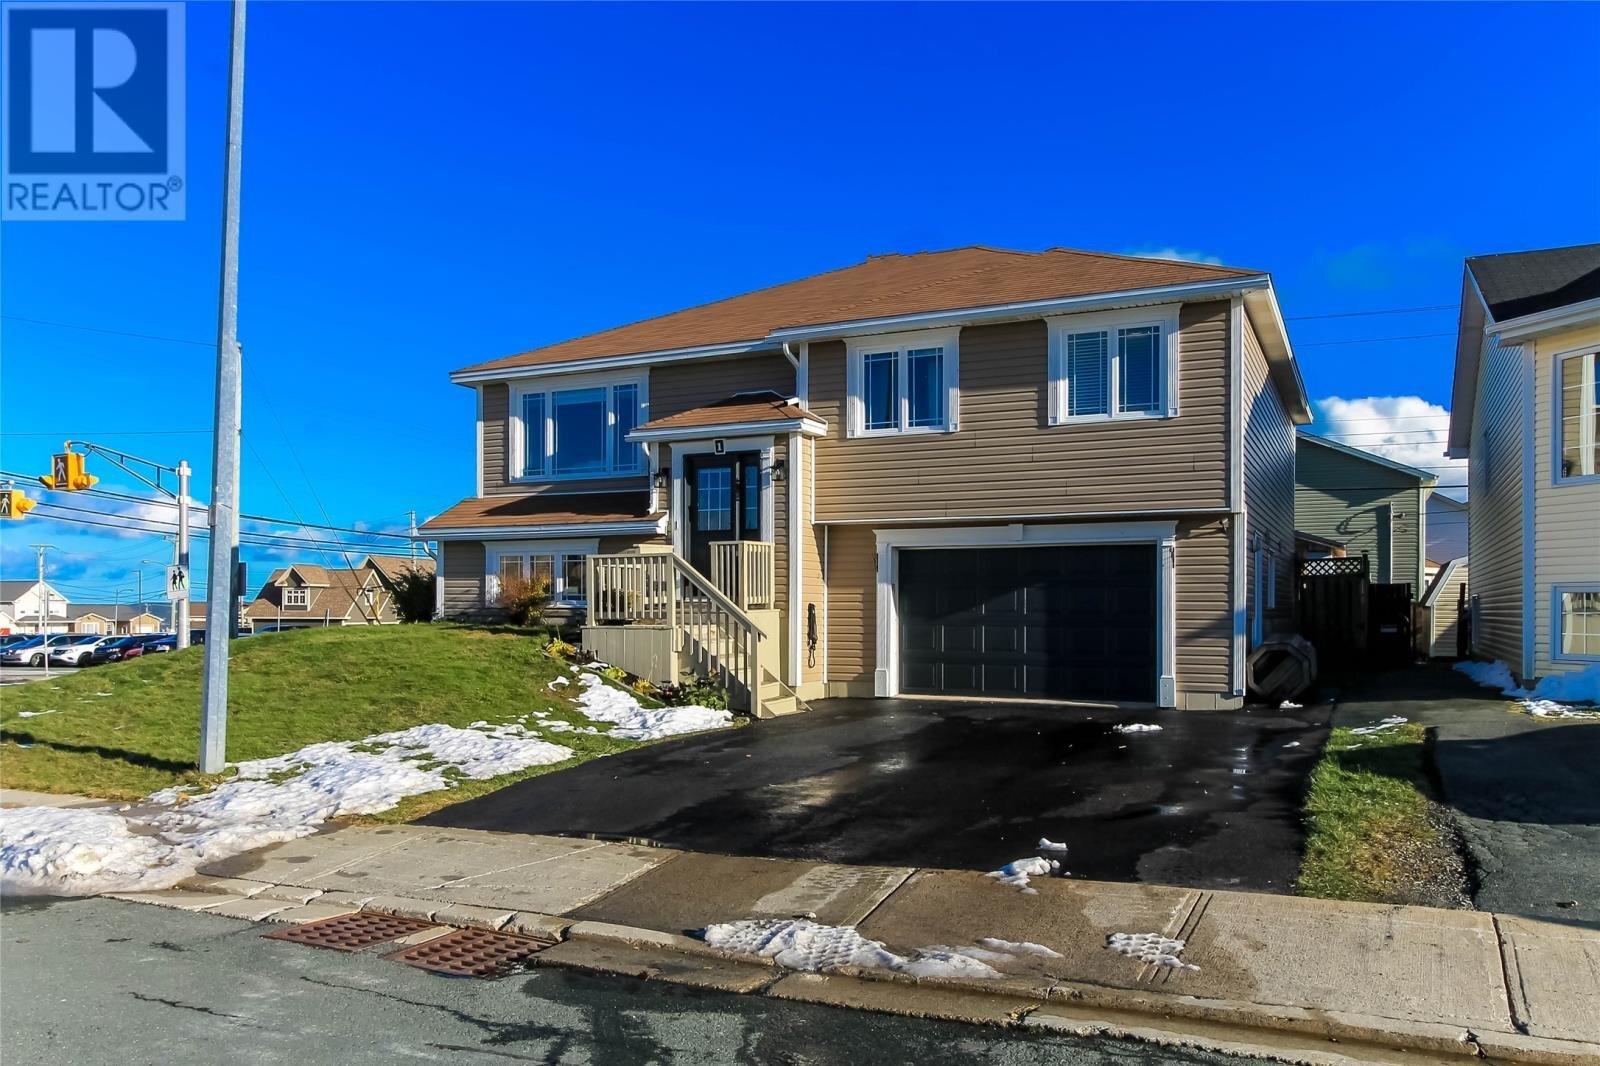 House for sale at 1 Macbeth Dr St. John's Newfoundland - MLS: 1223777